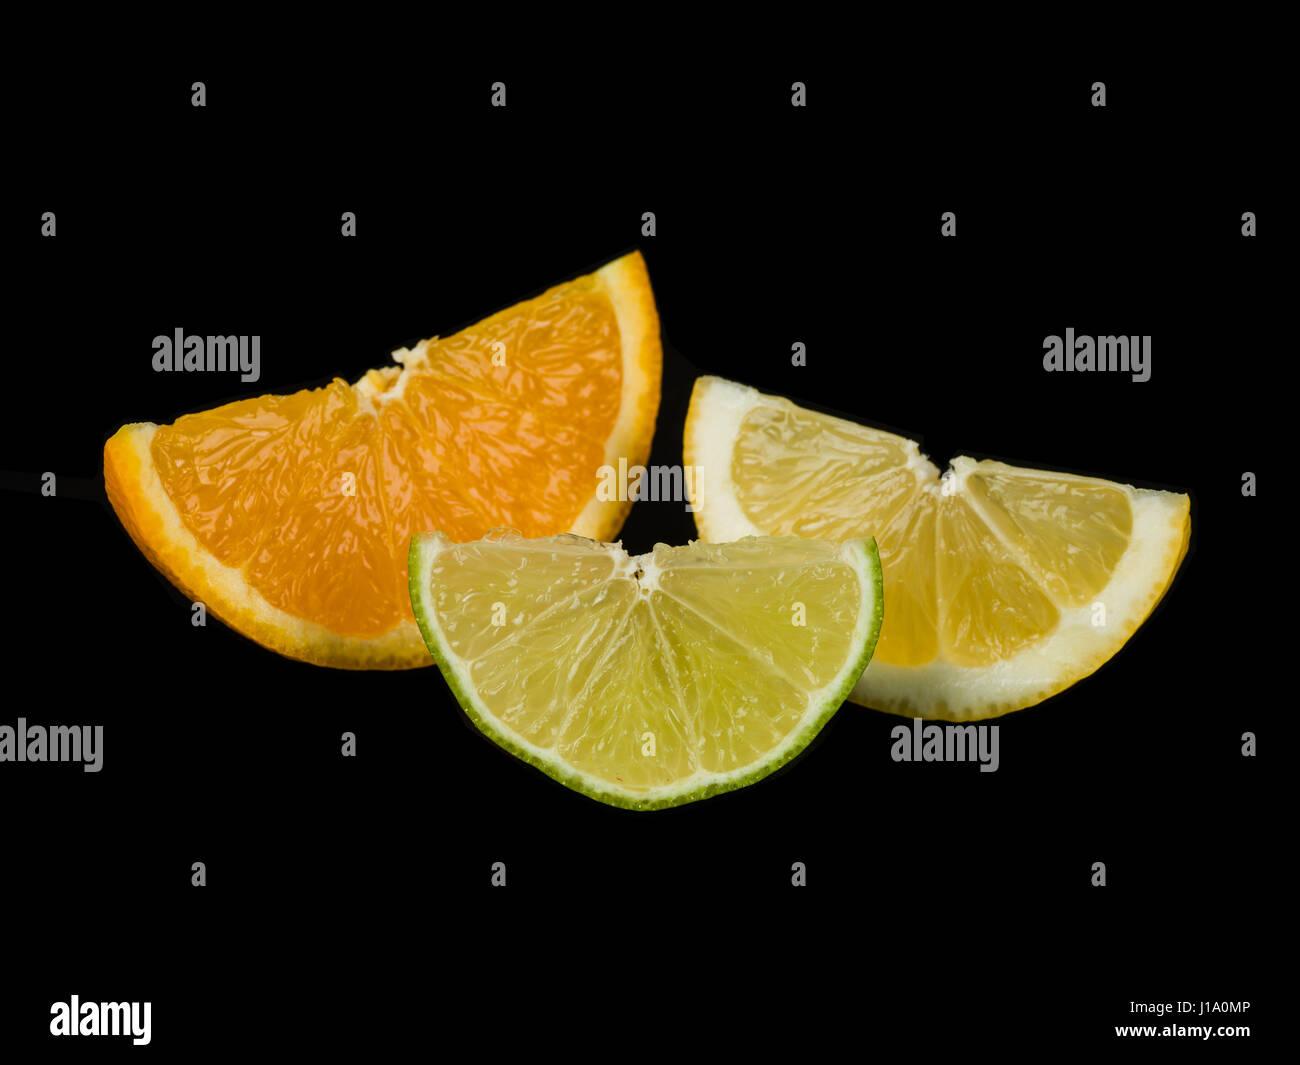 Orange Lime and Lemon Segments Against a Black Background - Stock Image